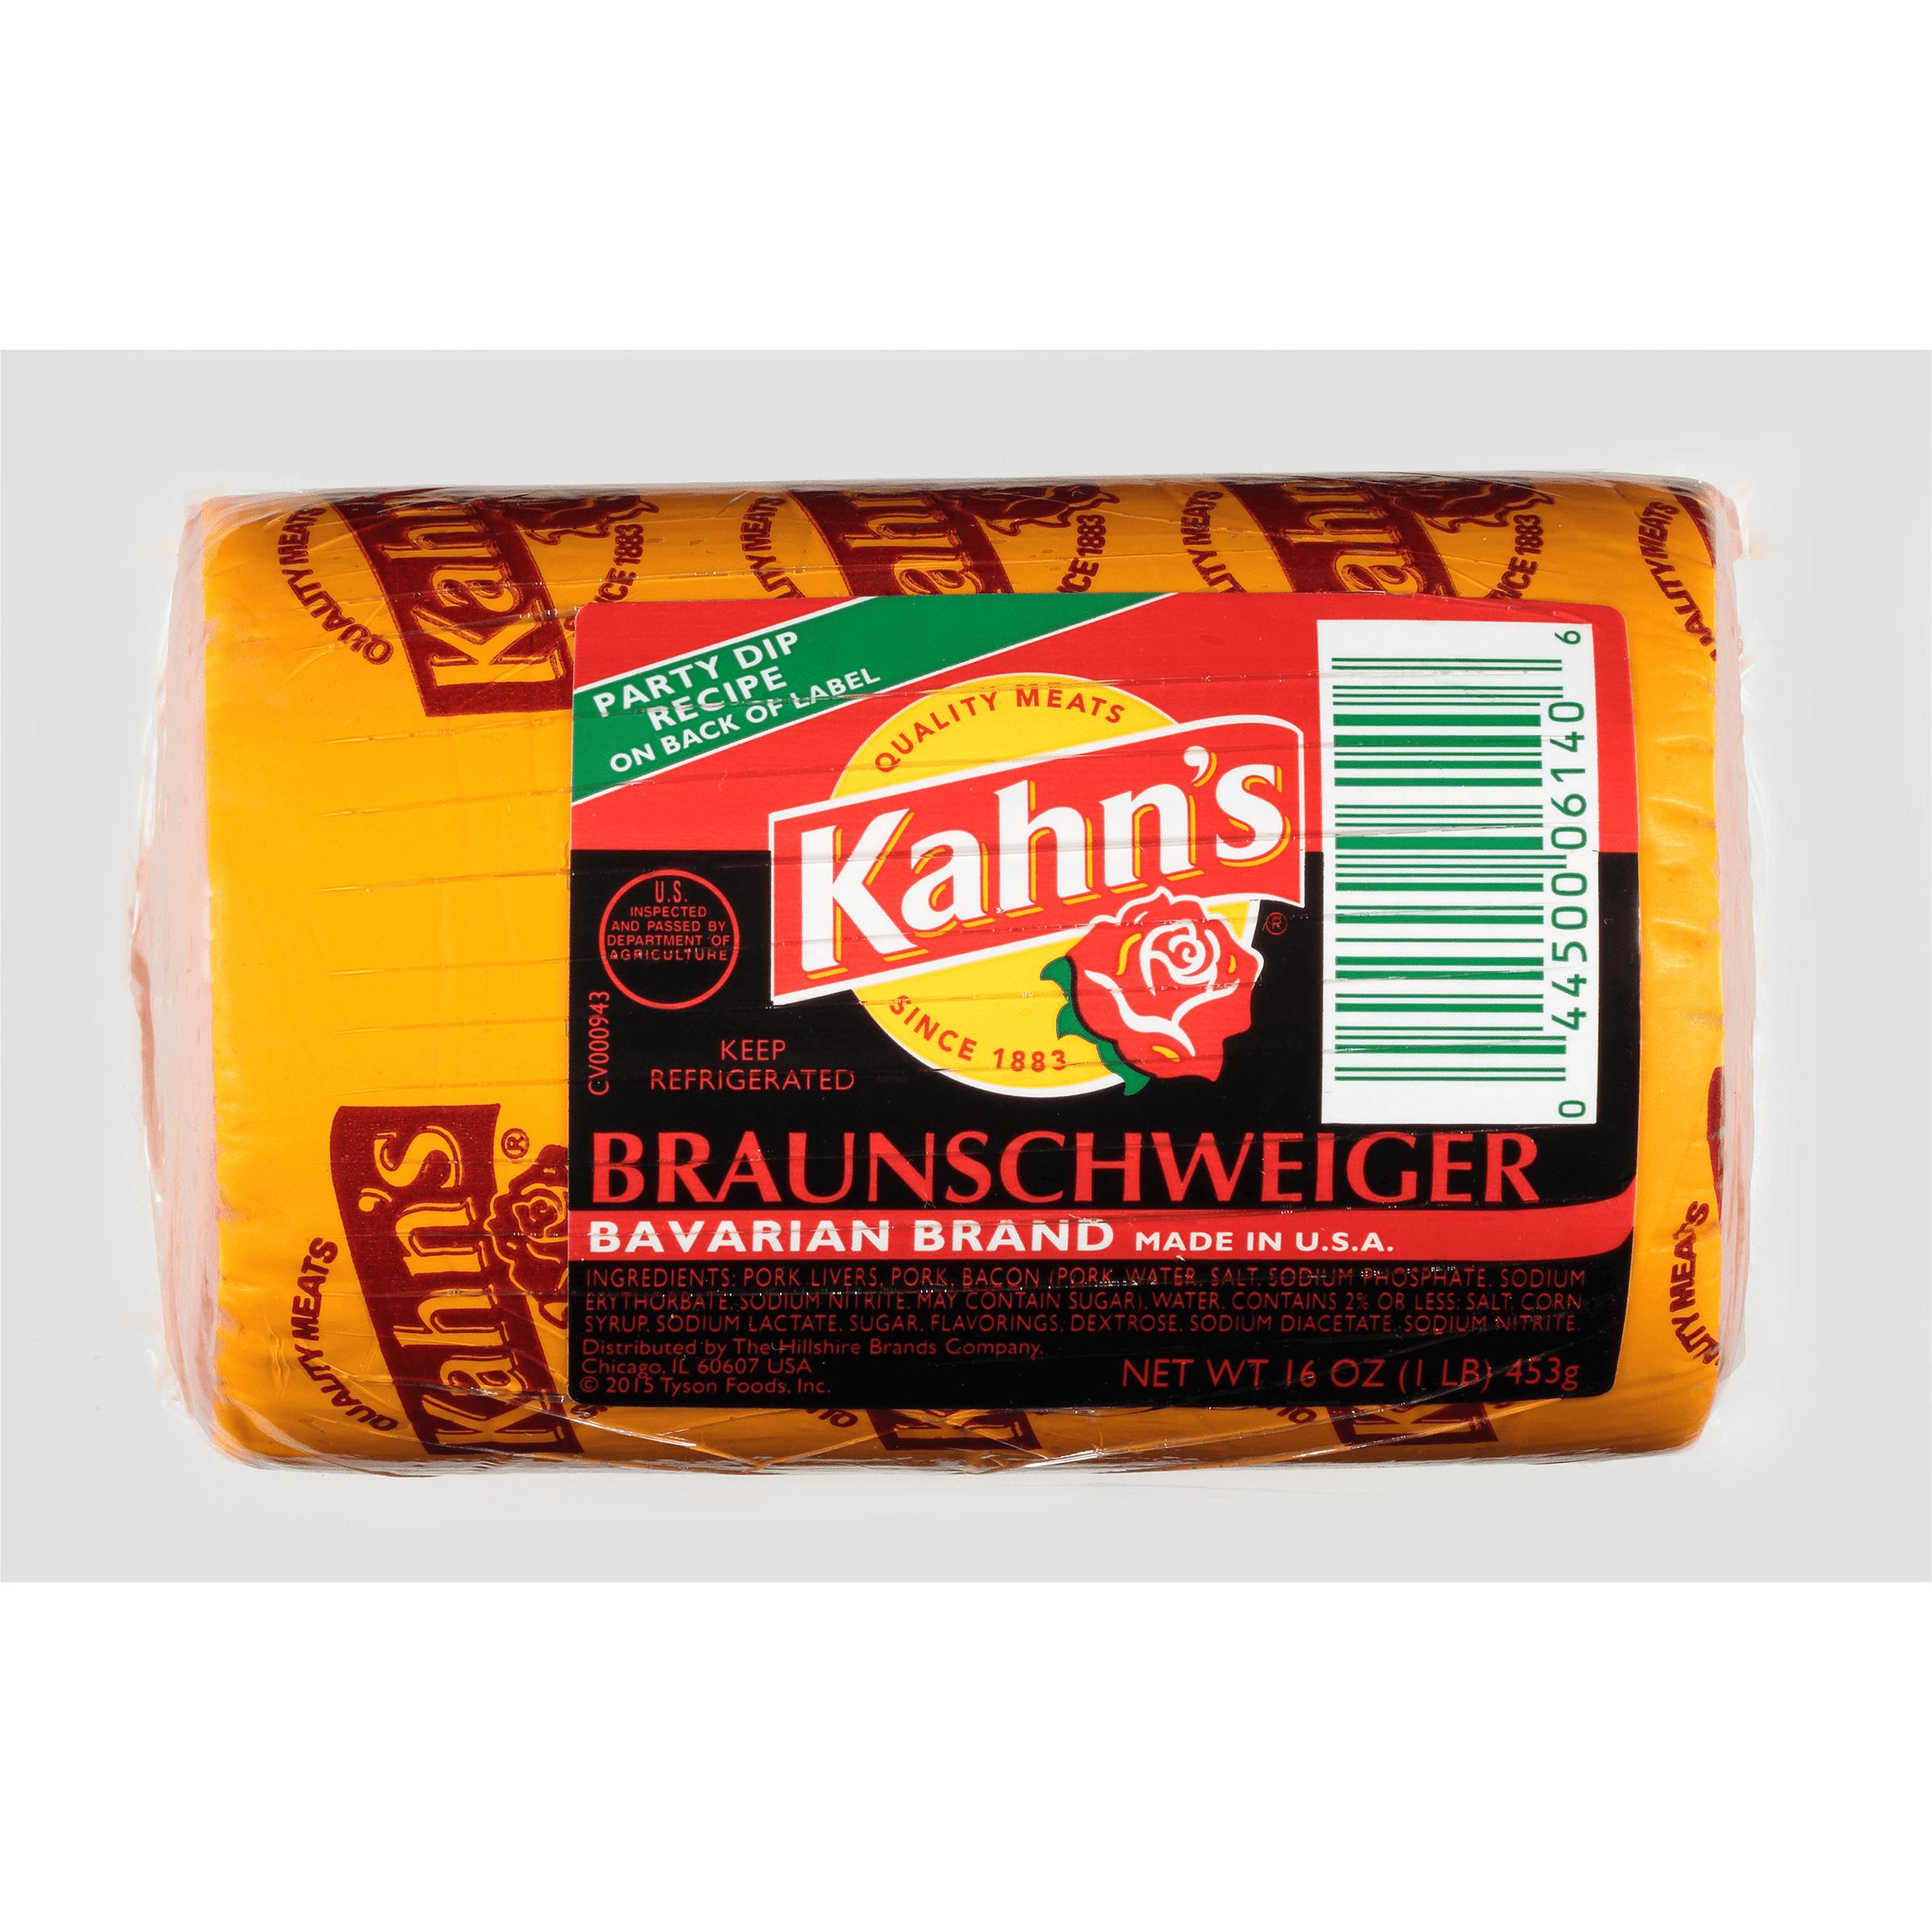 Kahn's® Bavarian Brand Braunschweiger, 1 lb.